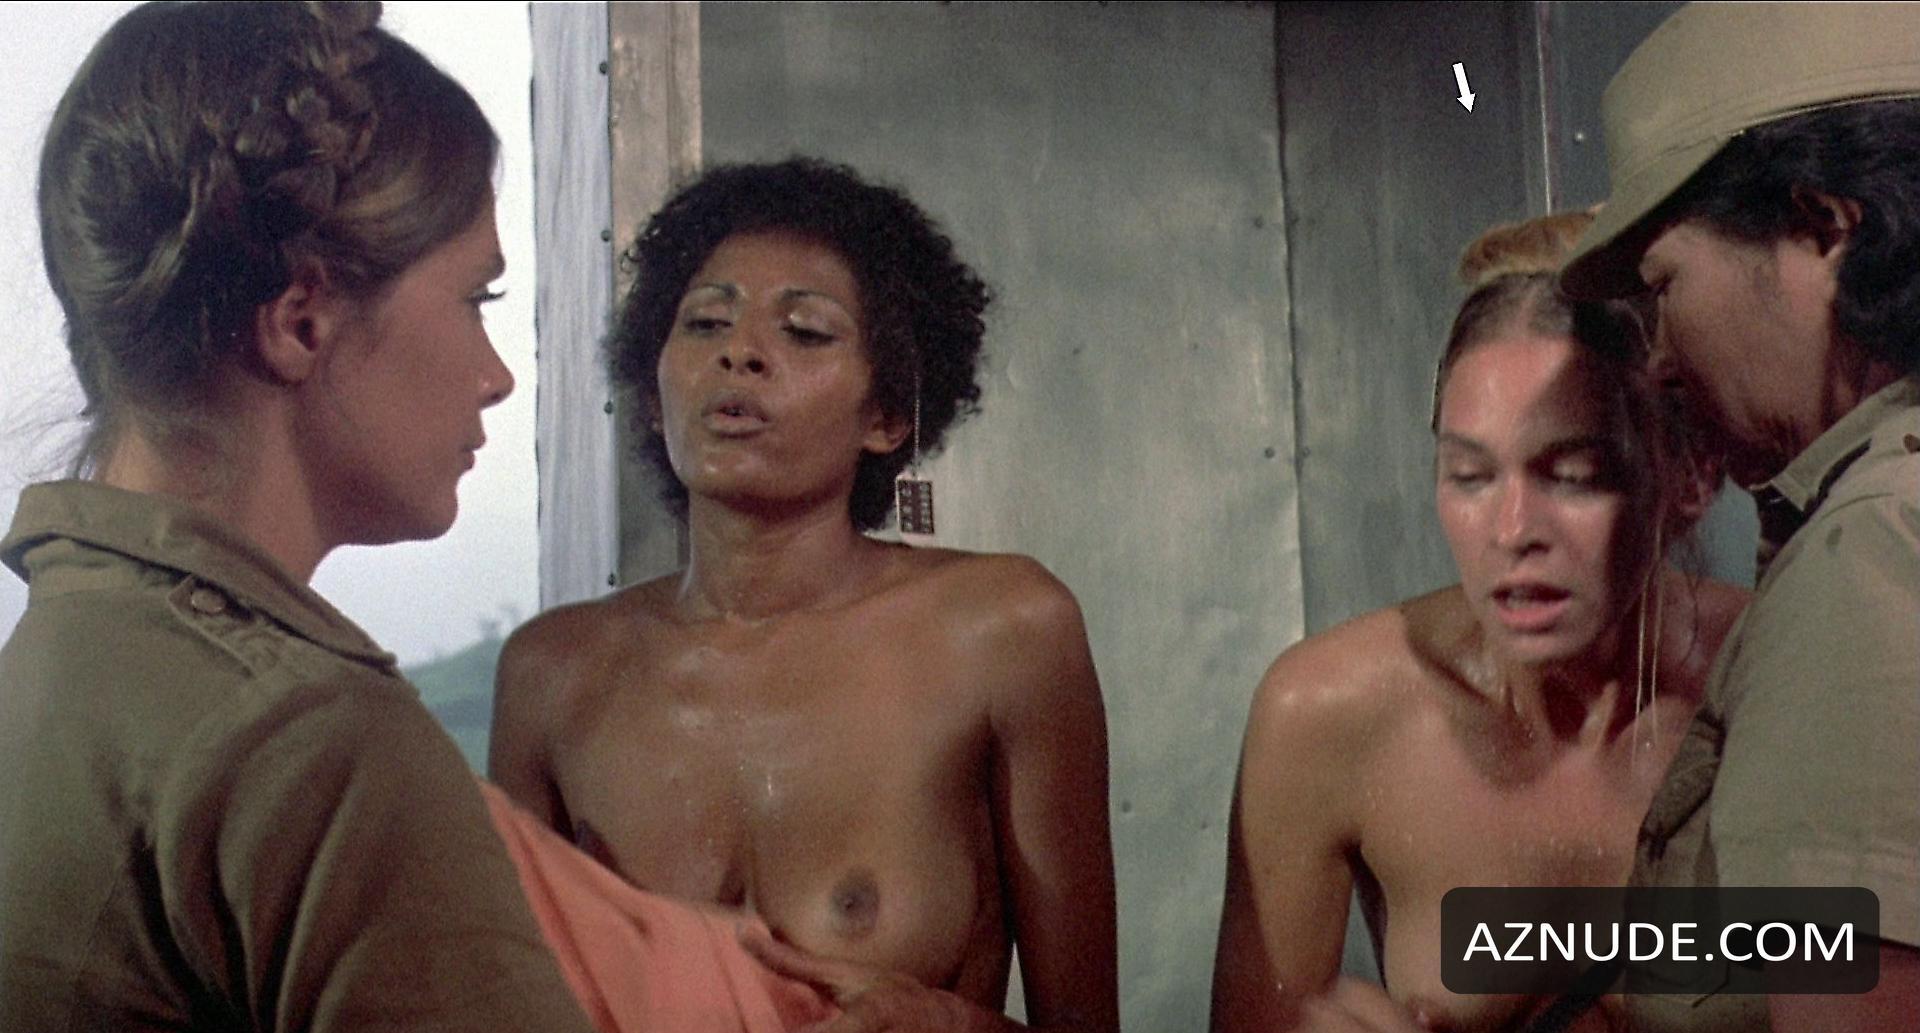 Thandie newton sex in the leading man scandalplanetcom - 2 part 2